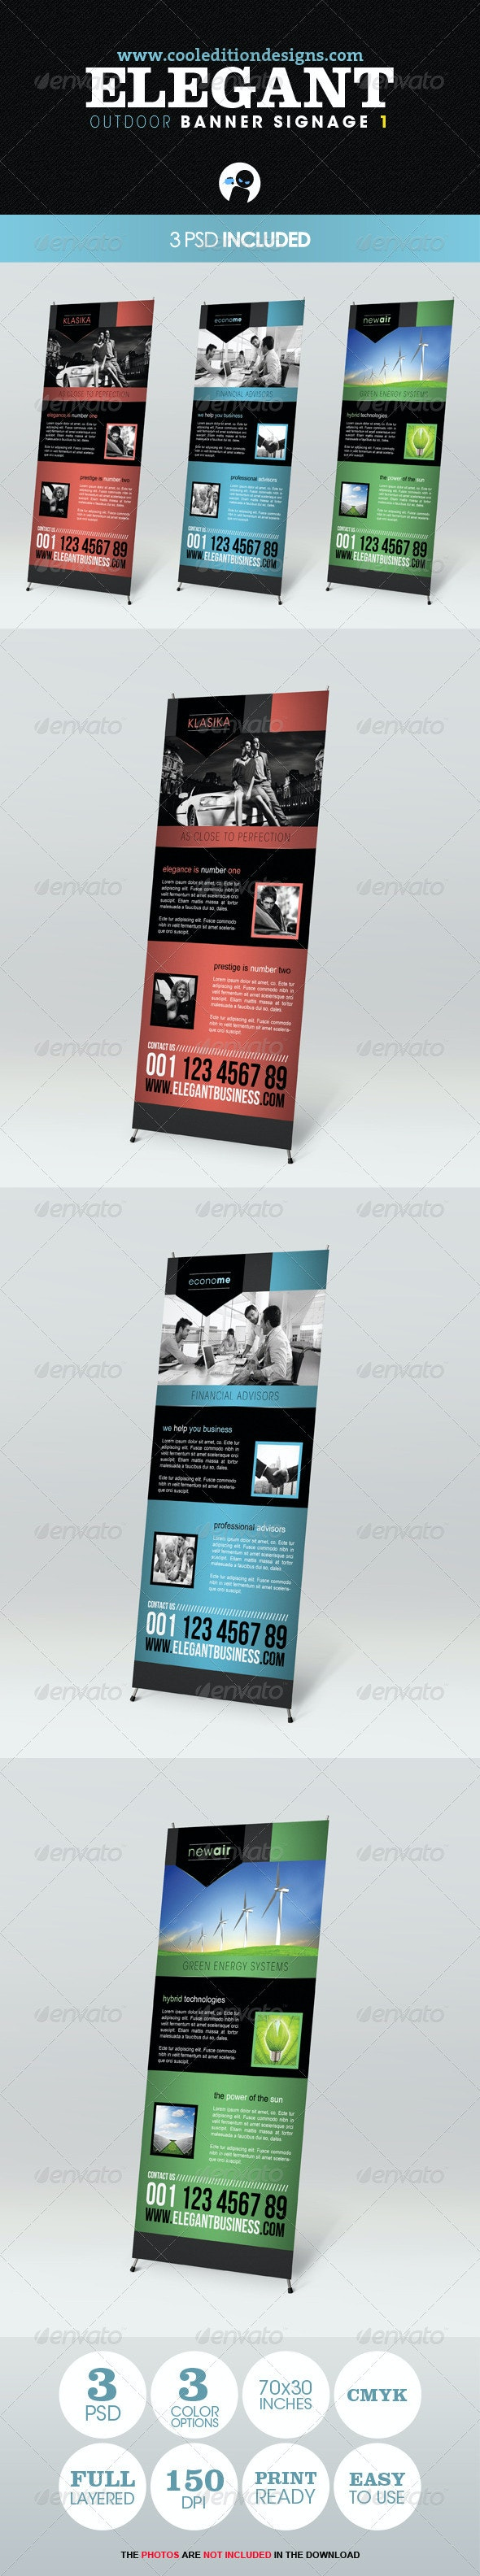 Elegant Outdoor Banner Signage 1 - Signage Print Templates